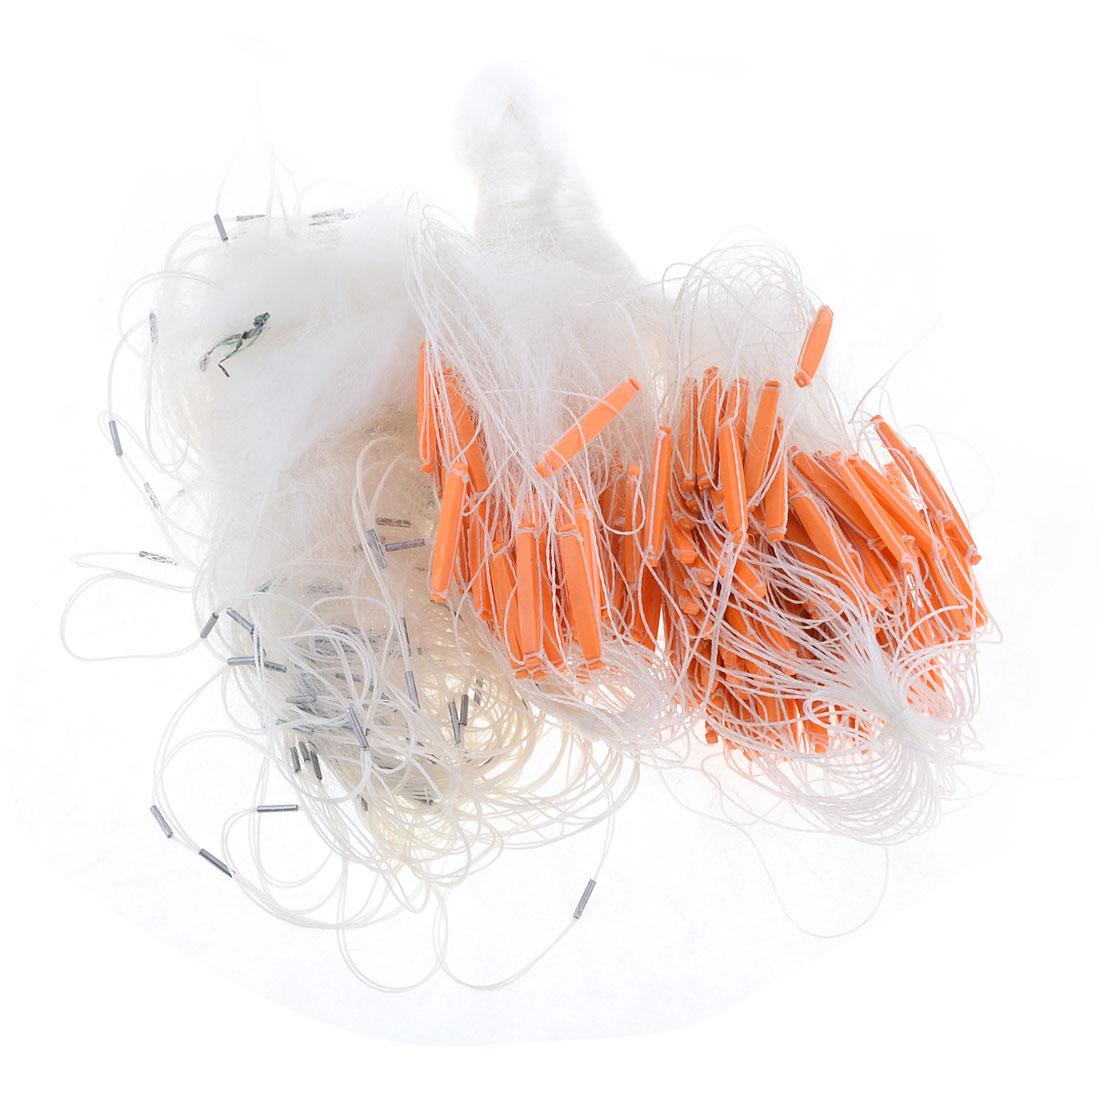 55M x 1.5M 3 Layers White Monofilament 6 x 6cm Hole Size Fish Gill Net